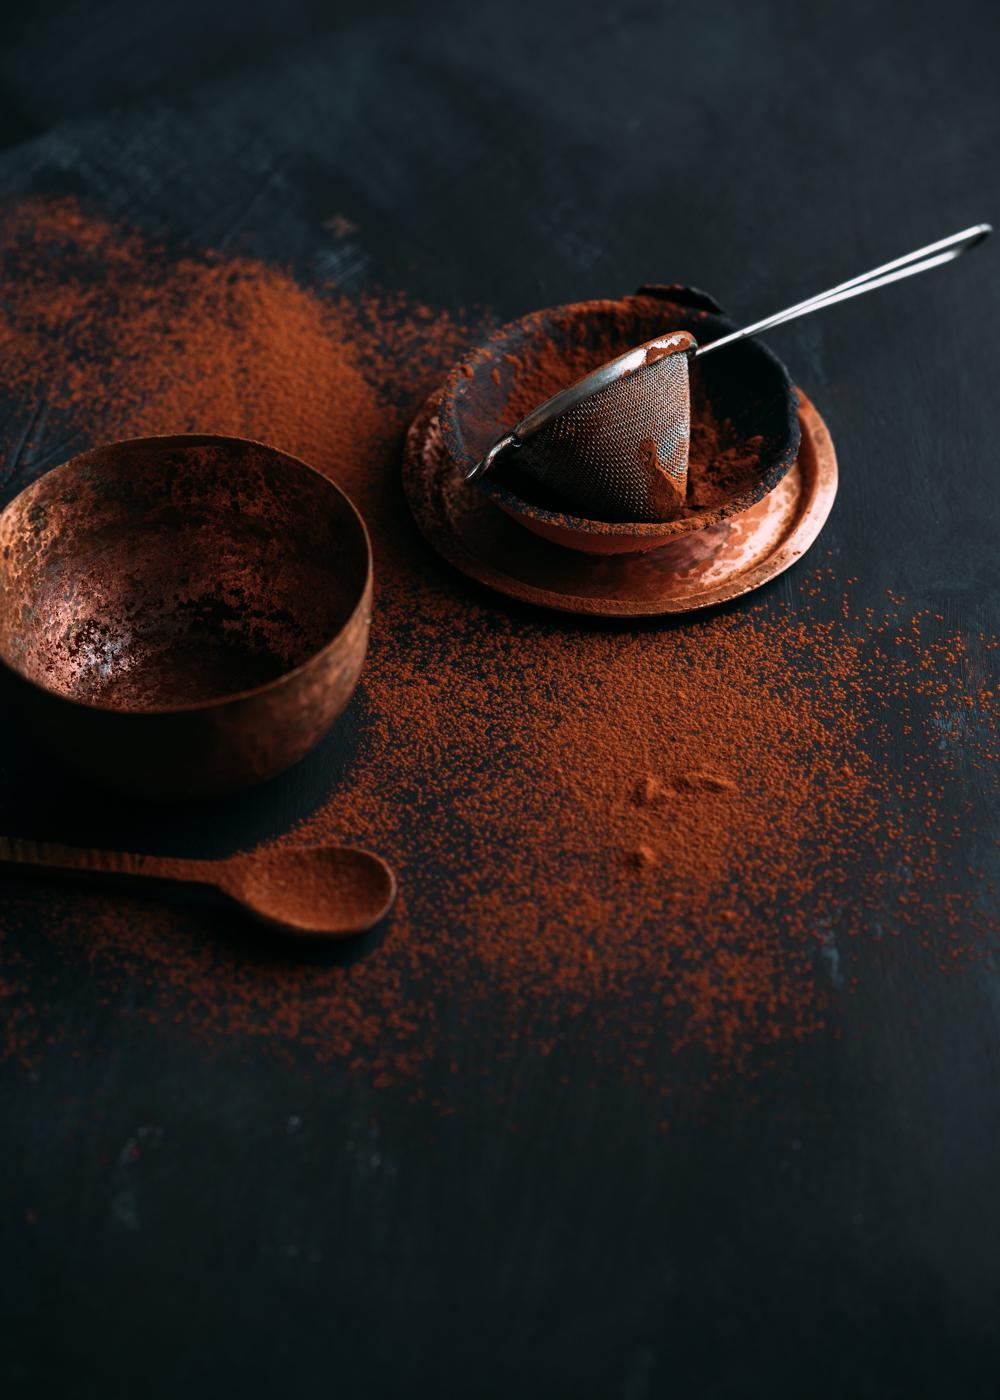 Chocolate0308.jpg